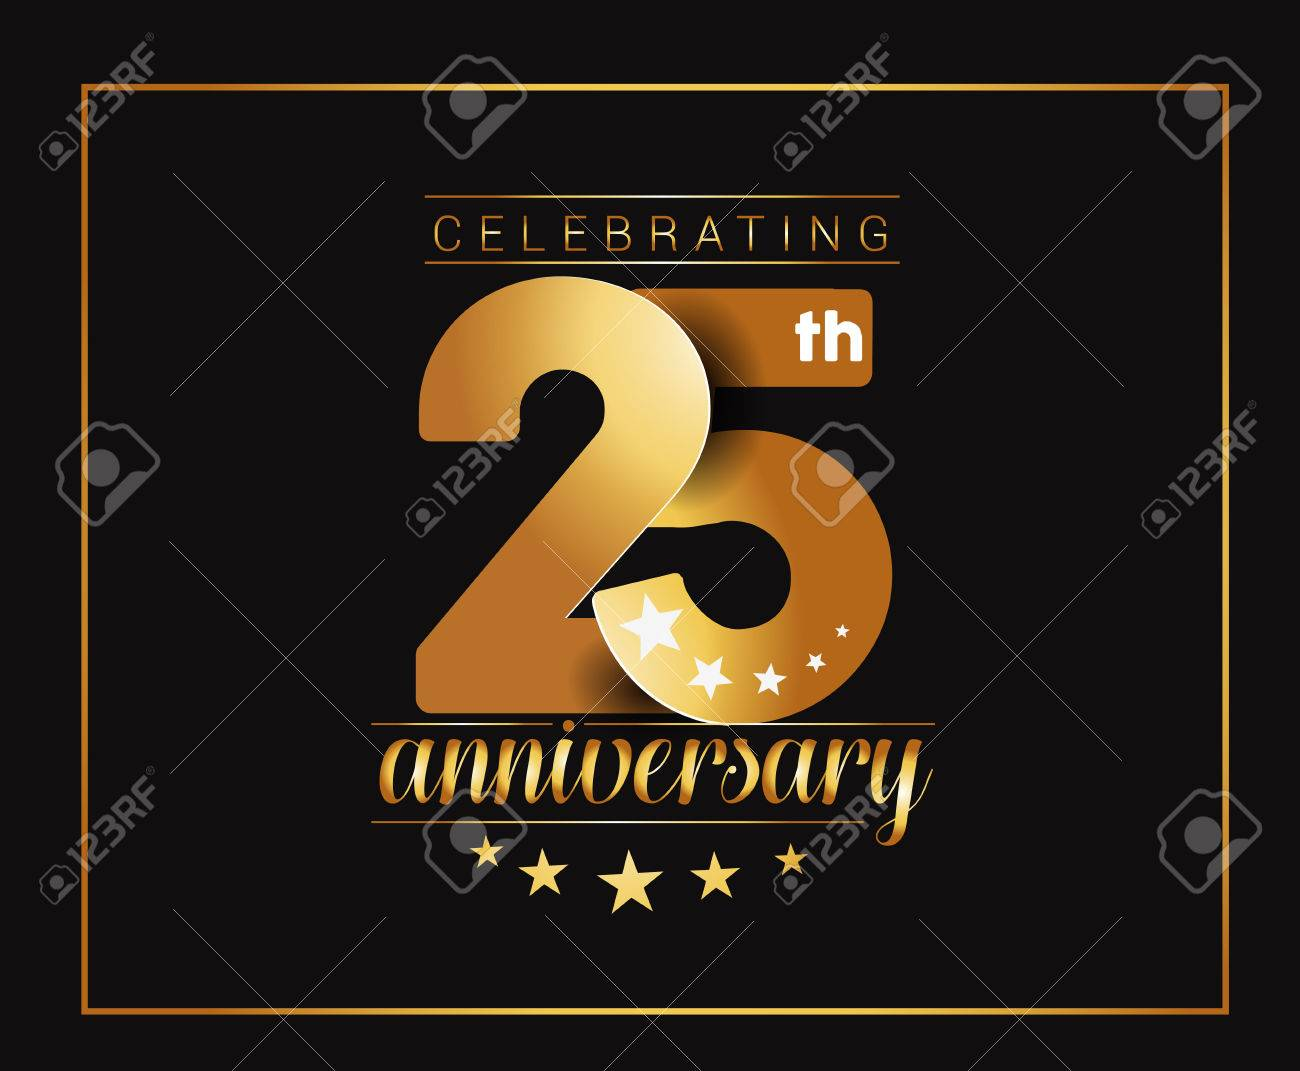 25th Years Anniversary Celebration Design. - 61055008